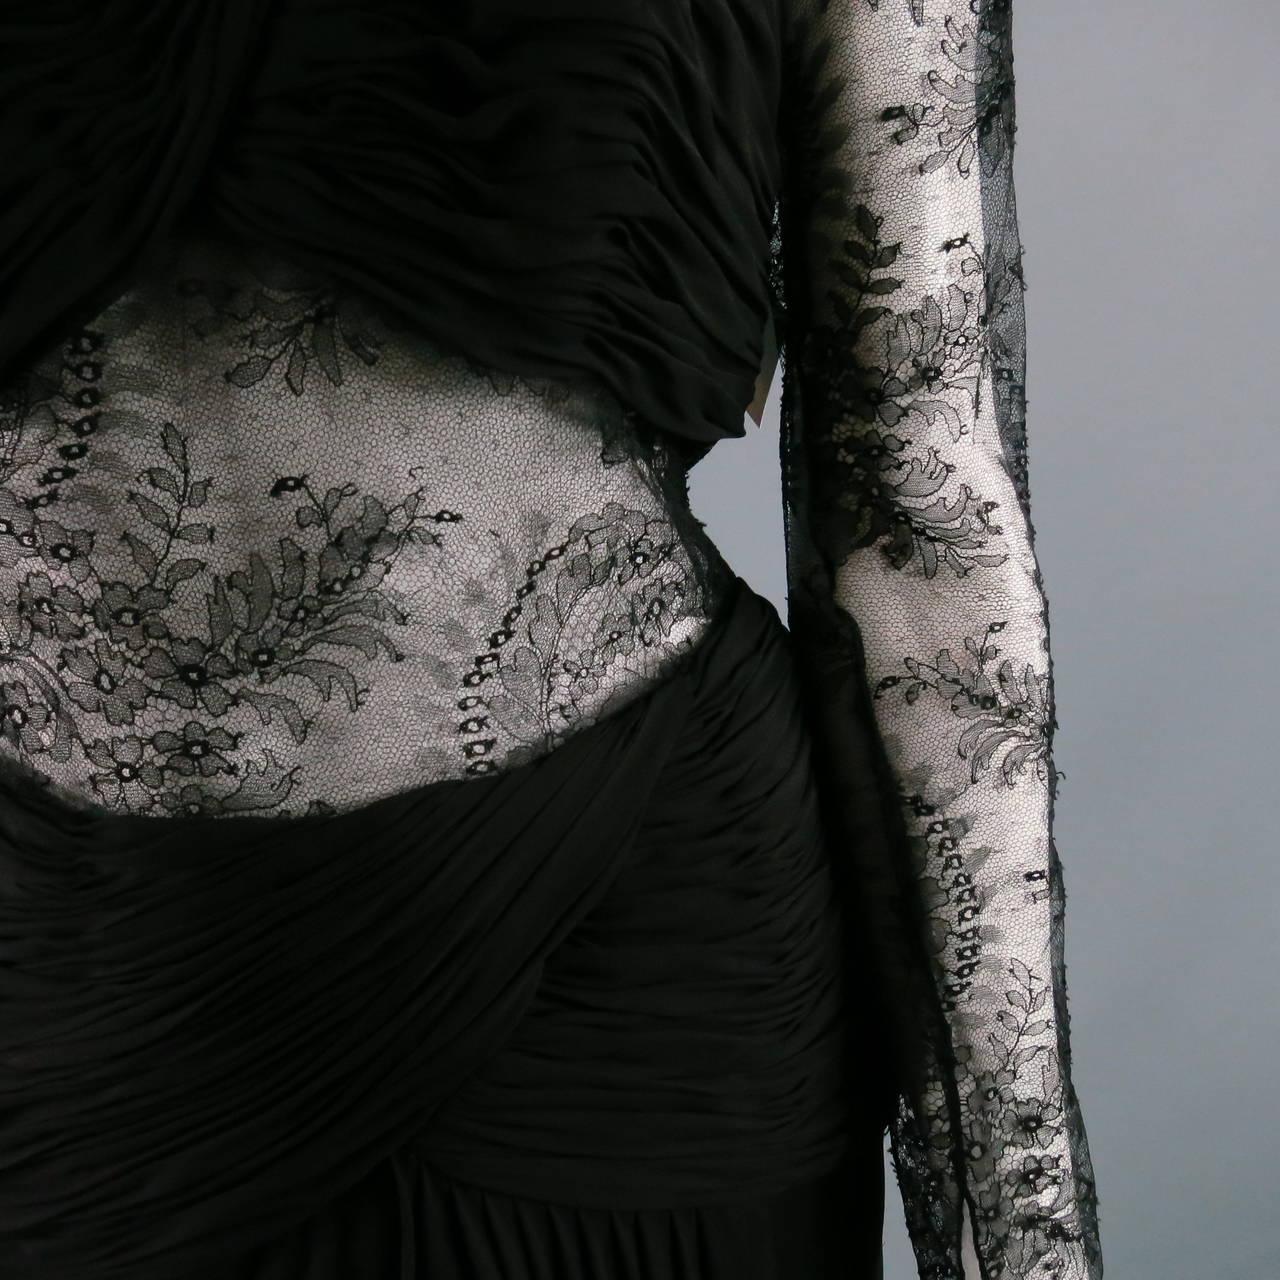 1990's OSCAR DE LA RENTA Size 8 Black Silk Lace Long Sleeve Gown/Evening Wear In Excellent Condition For Sale In San Francisco, CA